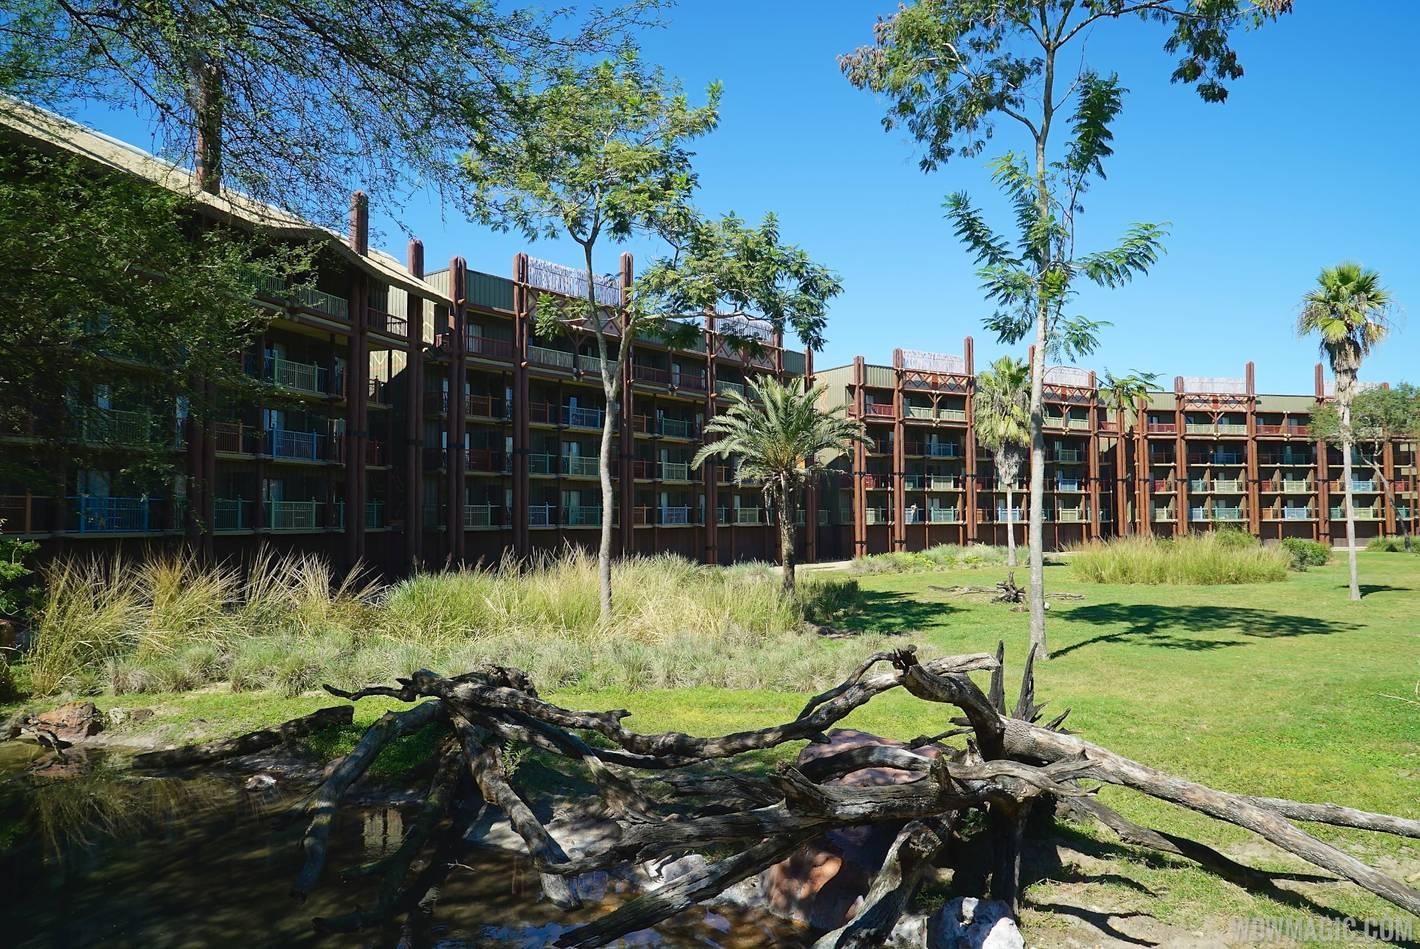 The savanna at Disney's Animal Kingdom Lodge